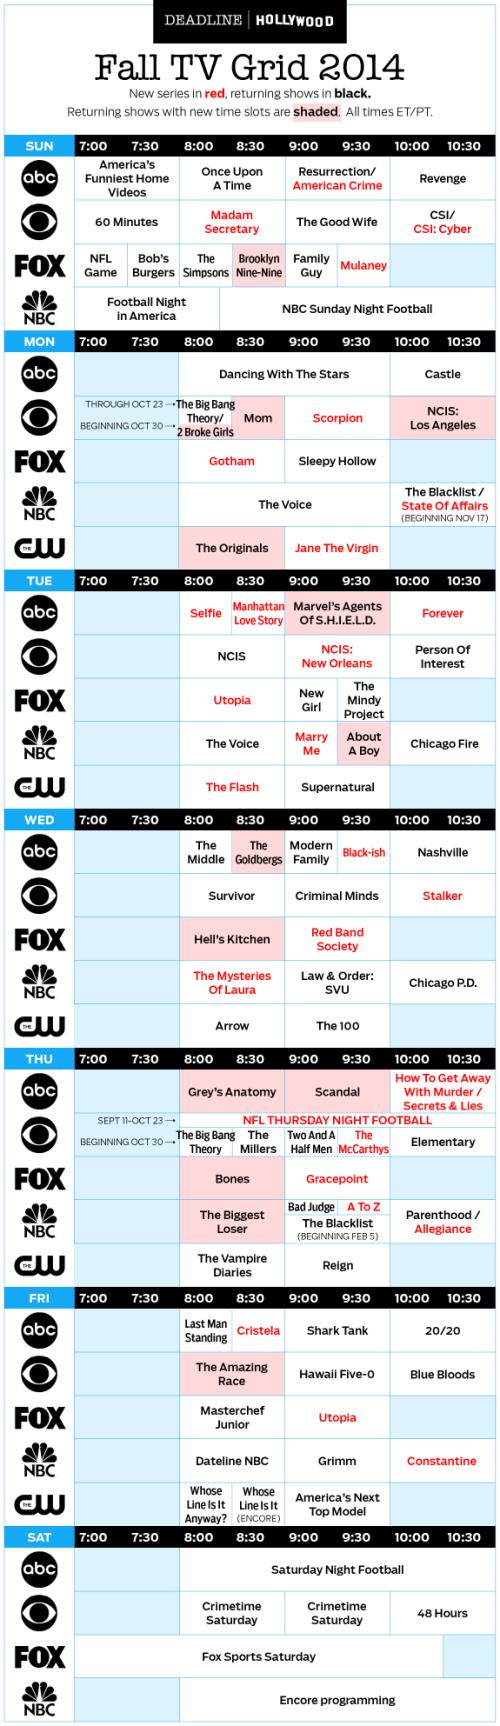 Fall 2014 TV Grid